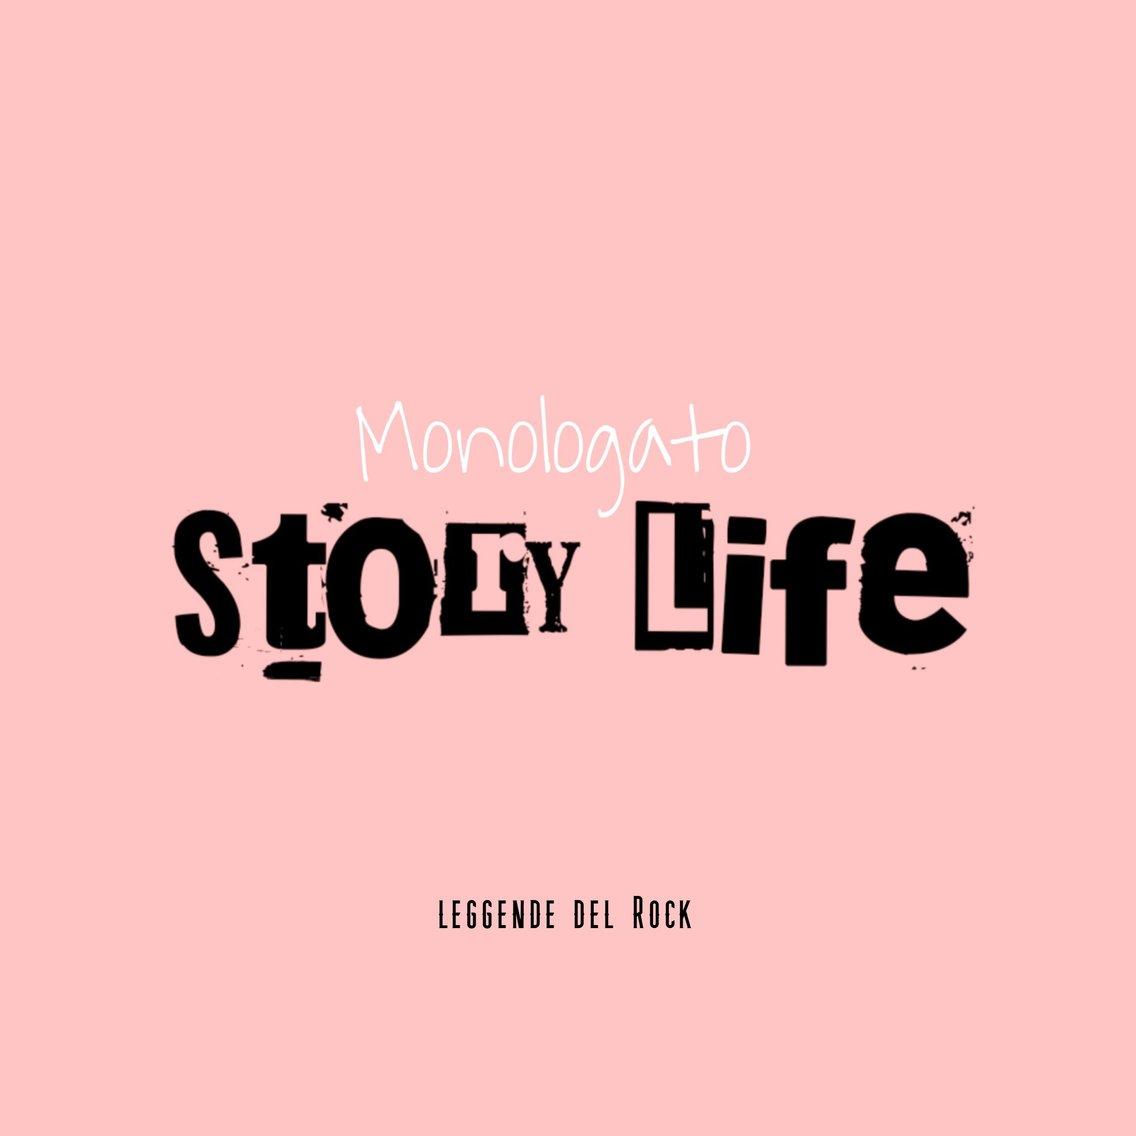 Story Life: Leggende del Rock - immagine di copertina